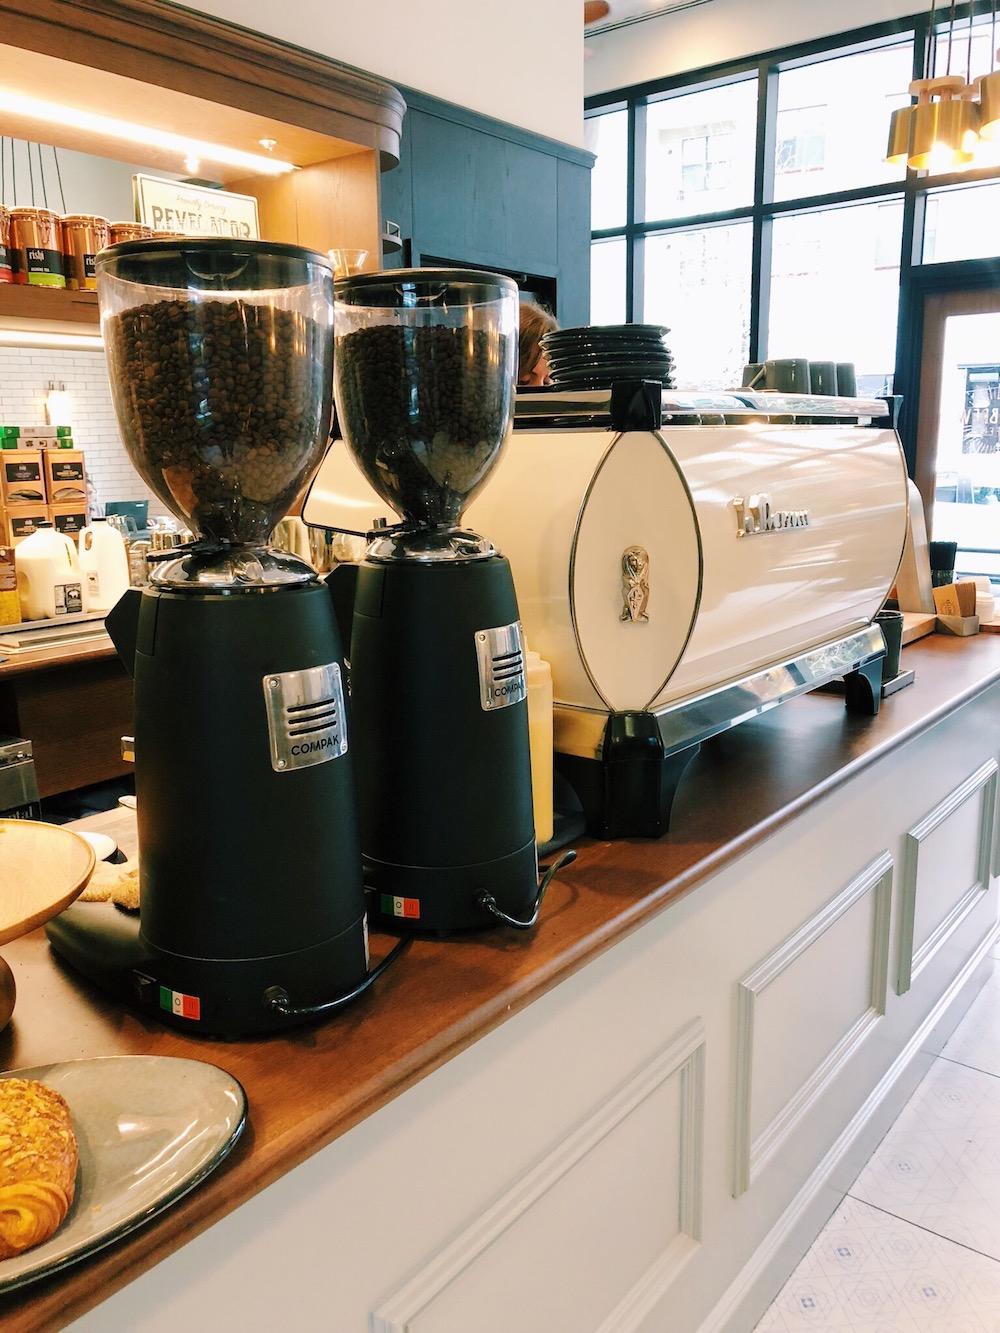 Old school espresso machine